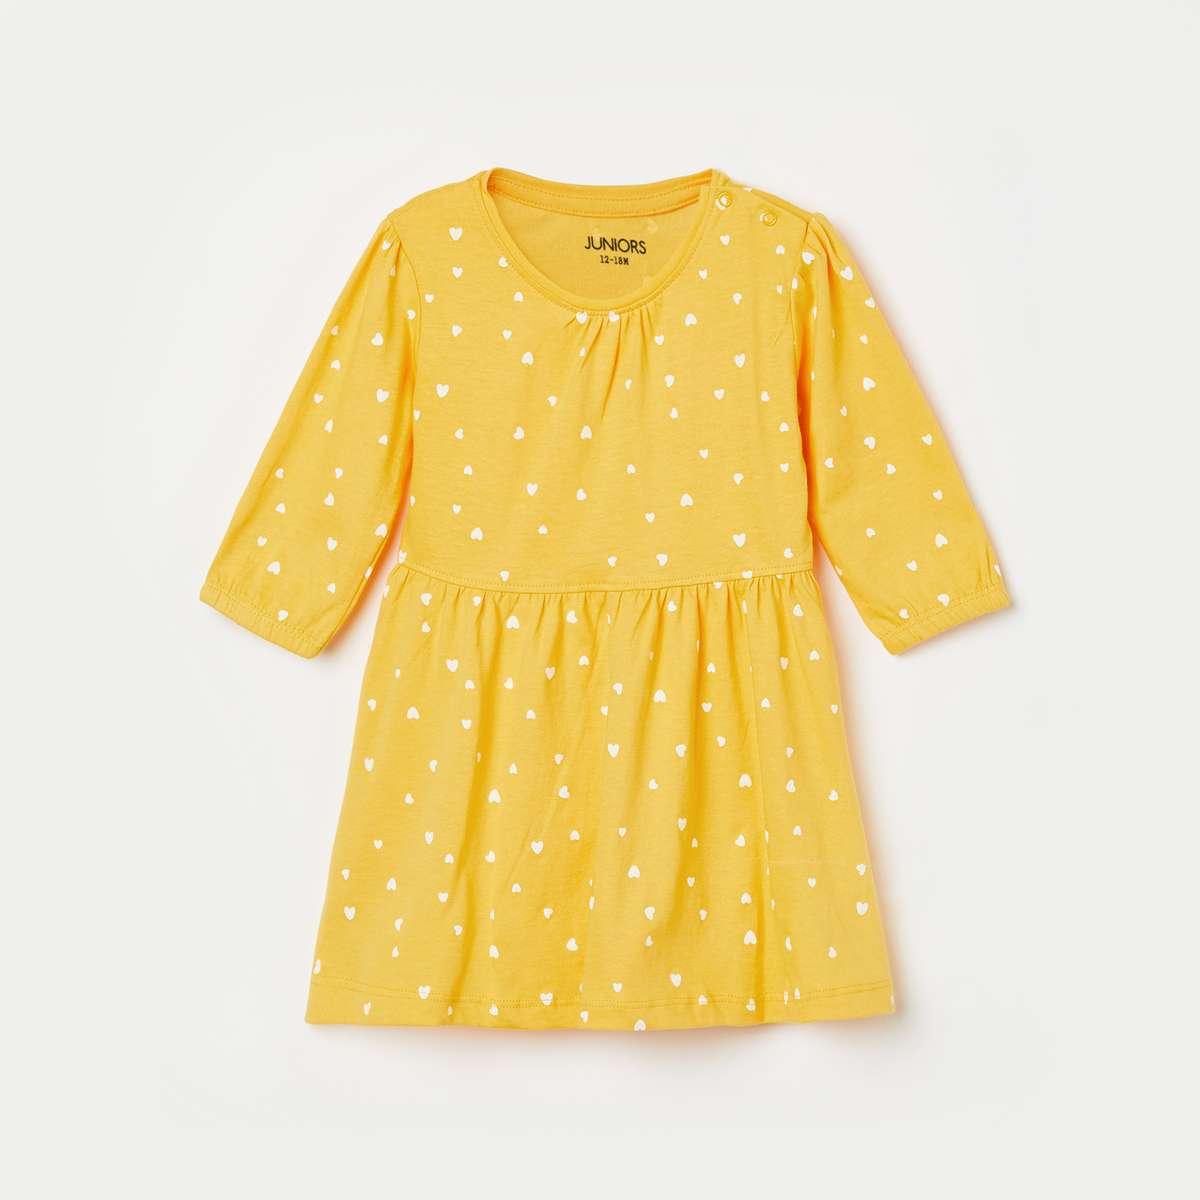 1.JUNIORS Girls Printed Round Neck A-line Dress